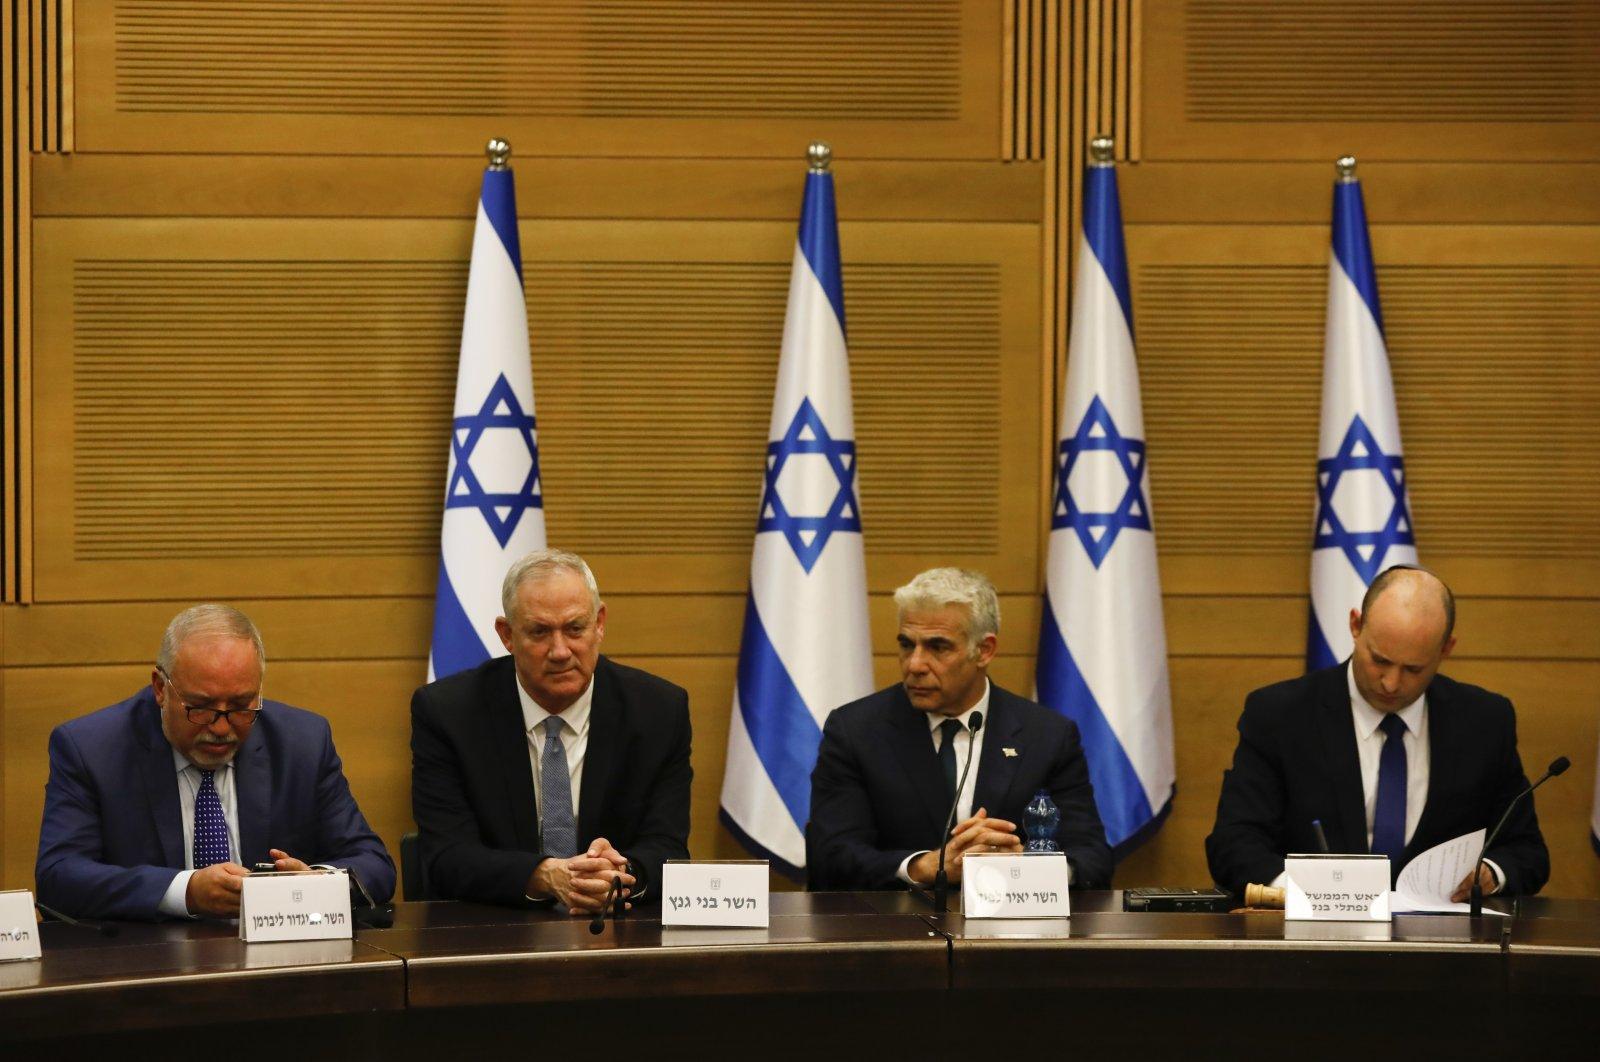 From left to right,  Avigdor Lieberman, Benny Gantz, Yair Lapid and Israeli Prime Minister Naftali Bennett hold a cabinet meeting. (AP Photo File Photo)